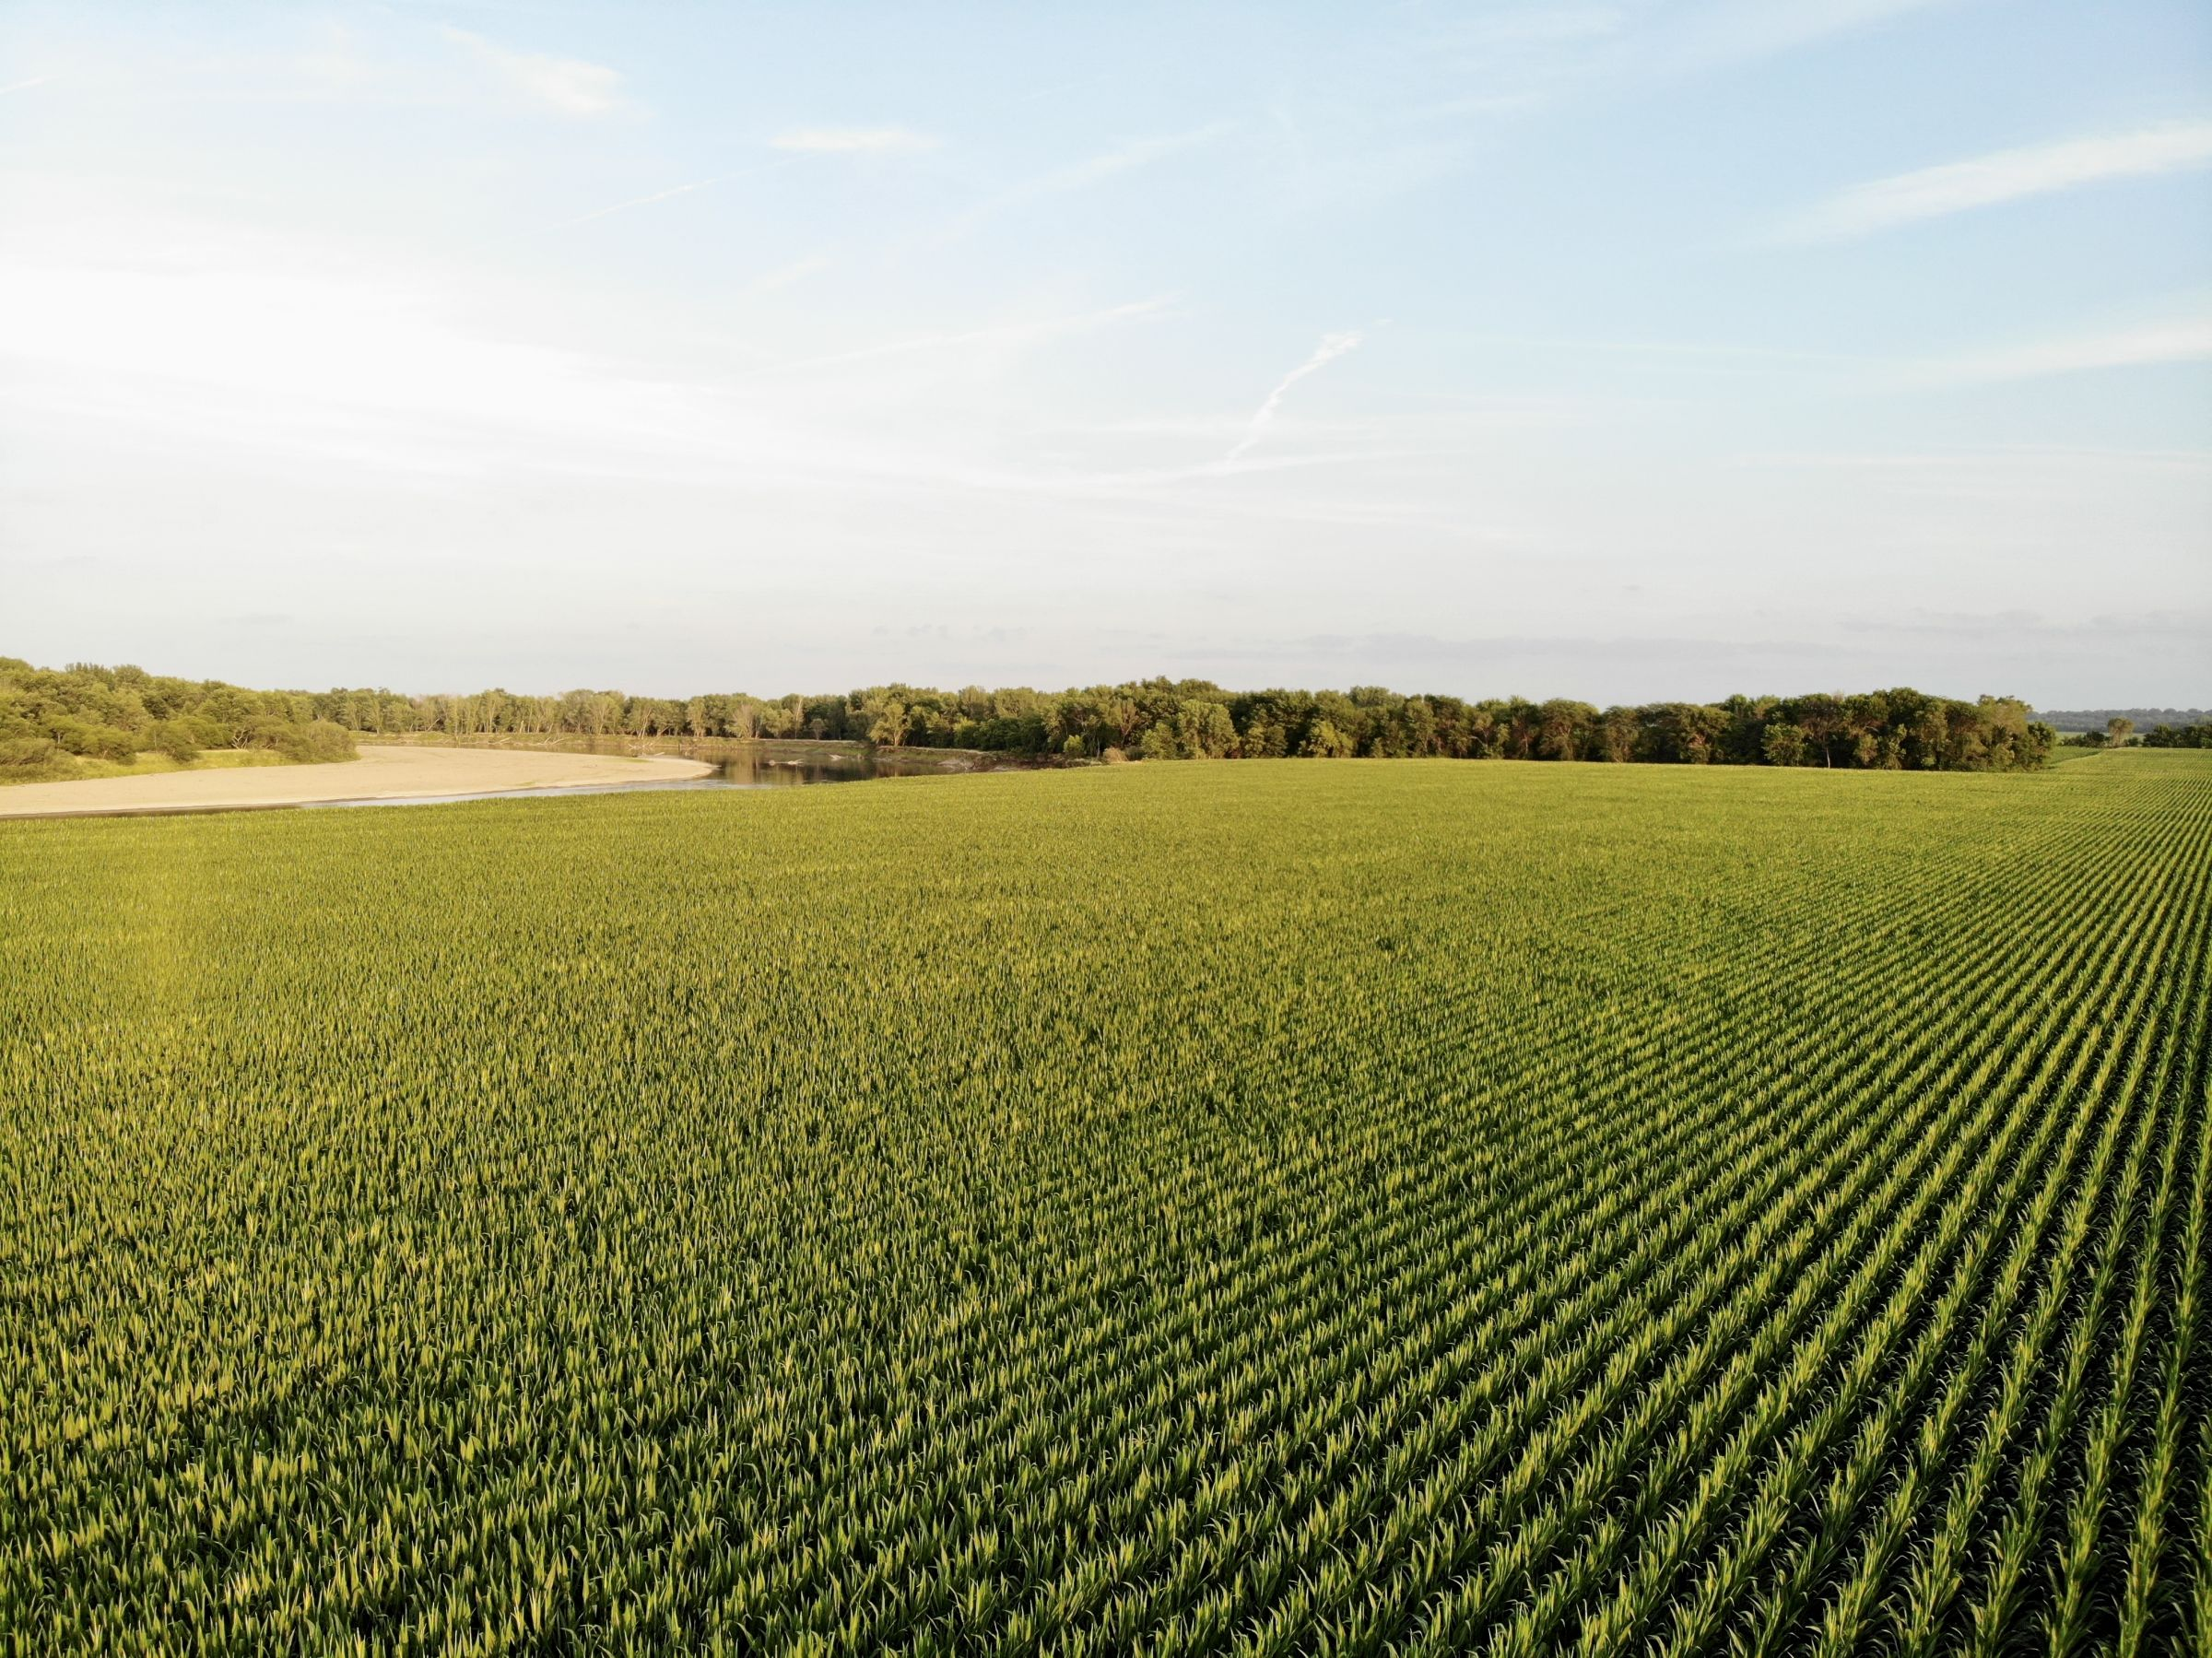 land-polk-county-iowa-202-acres-listing-number-15625-3-2021-07-09-140046.jpg